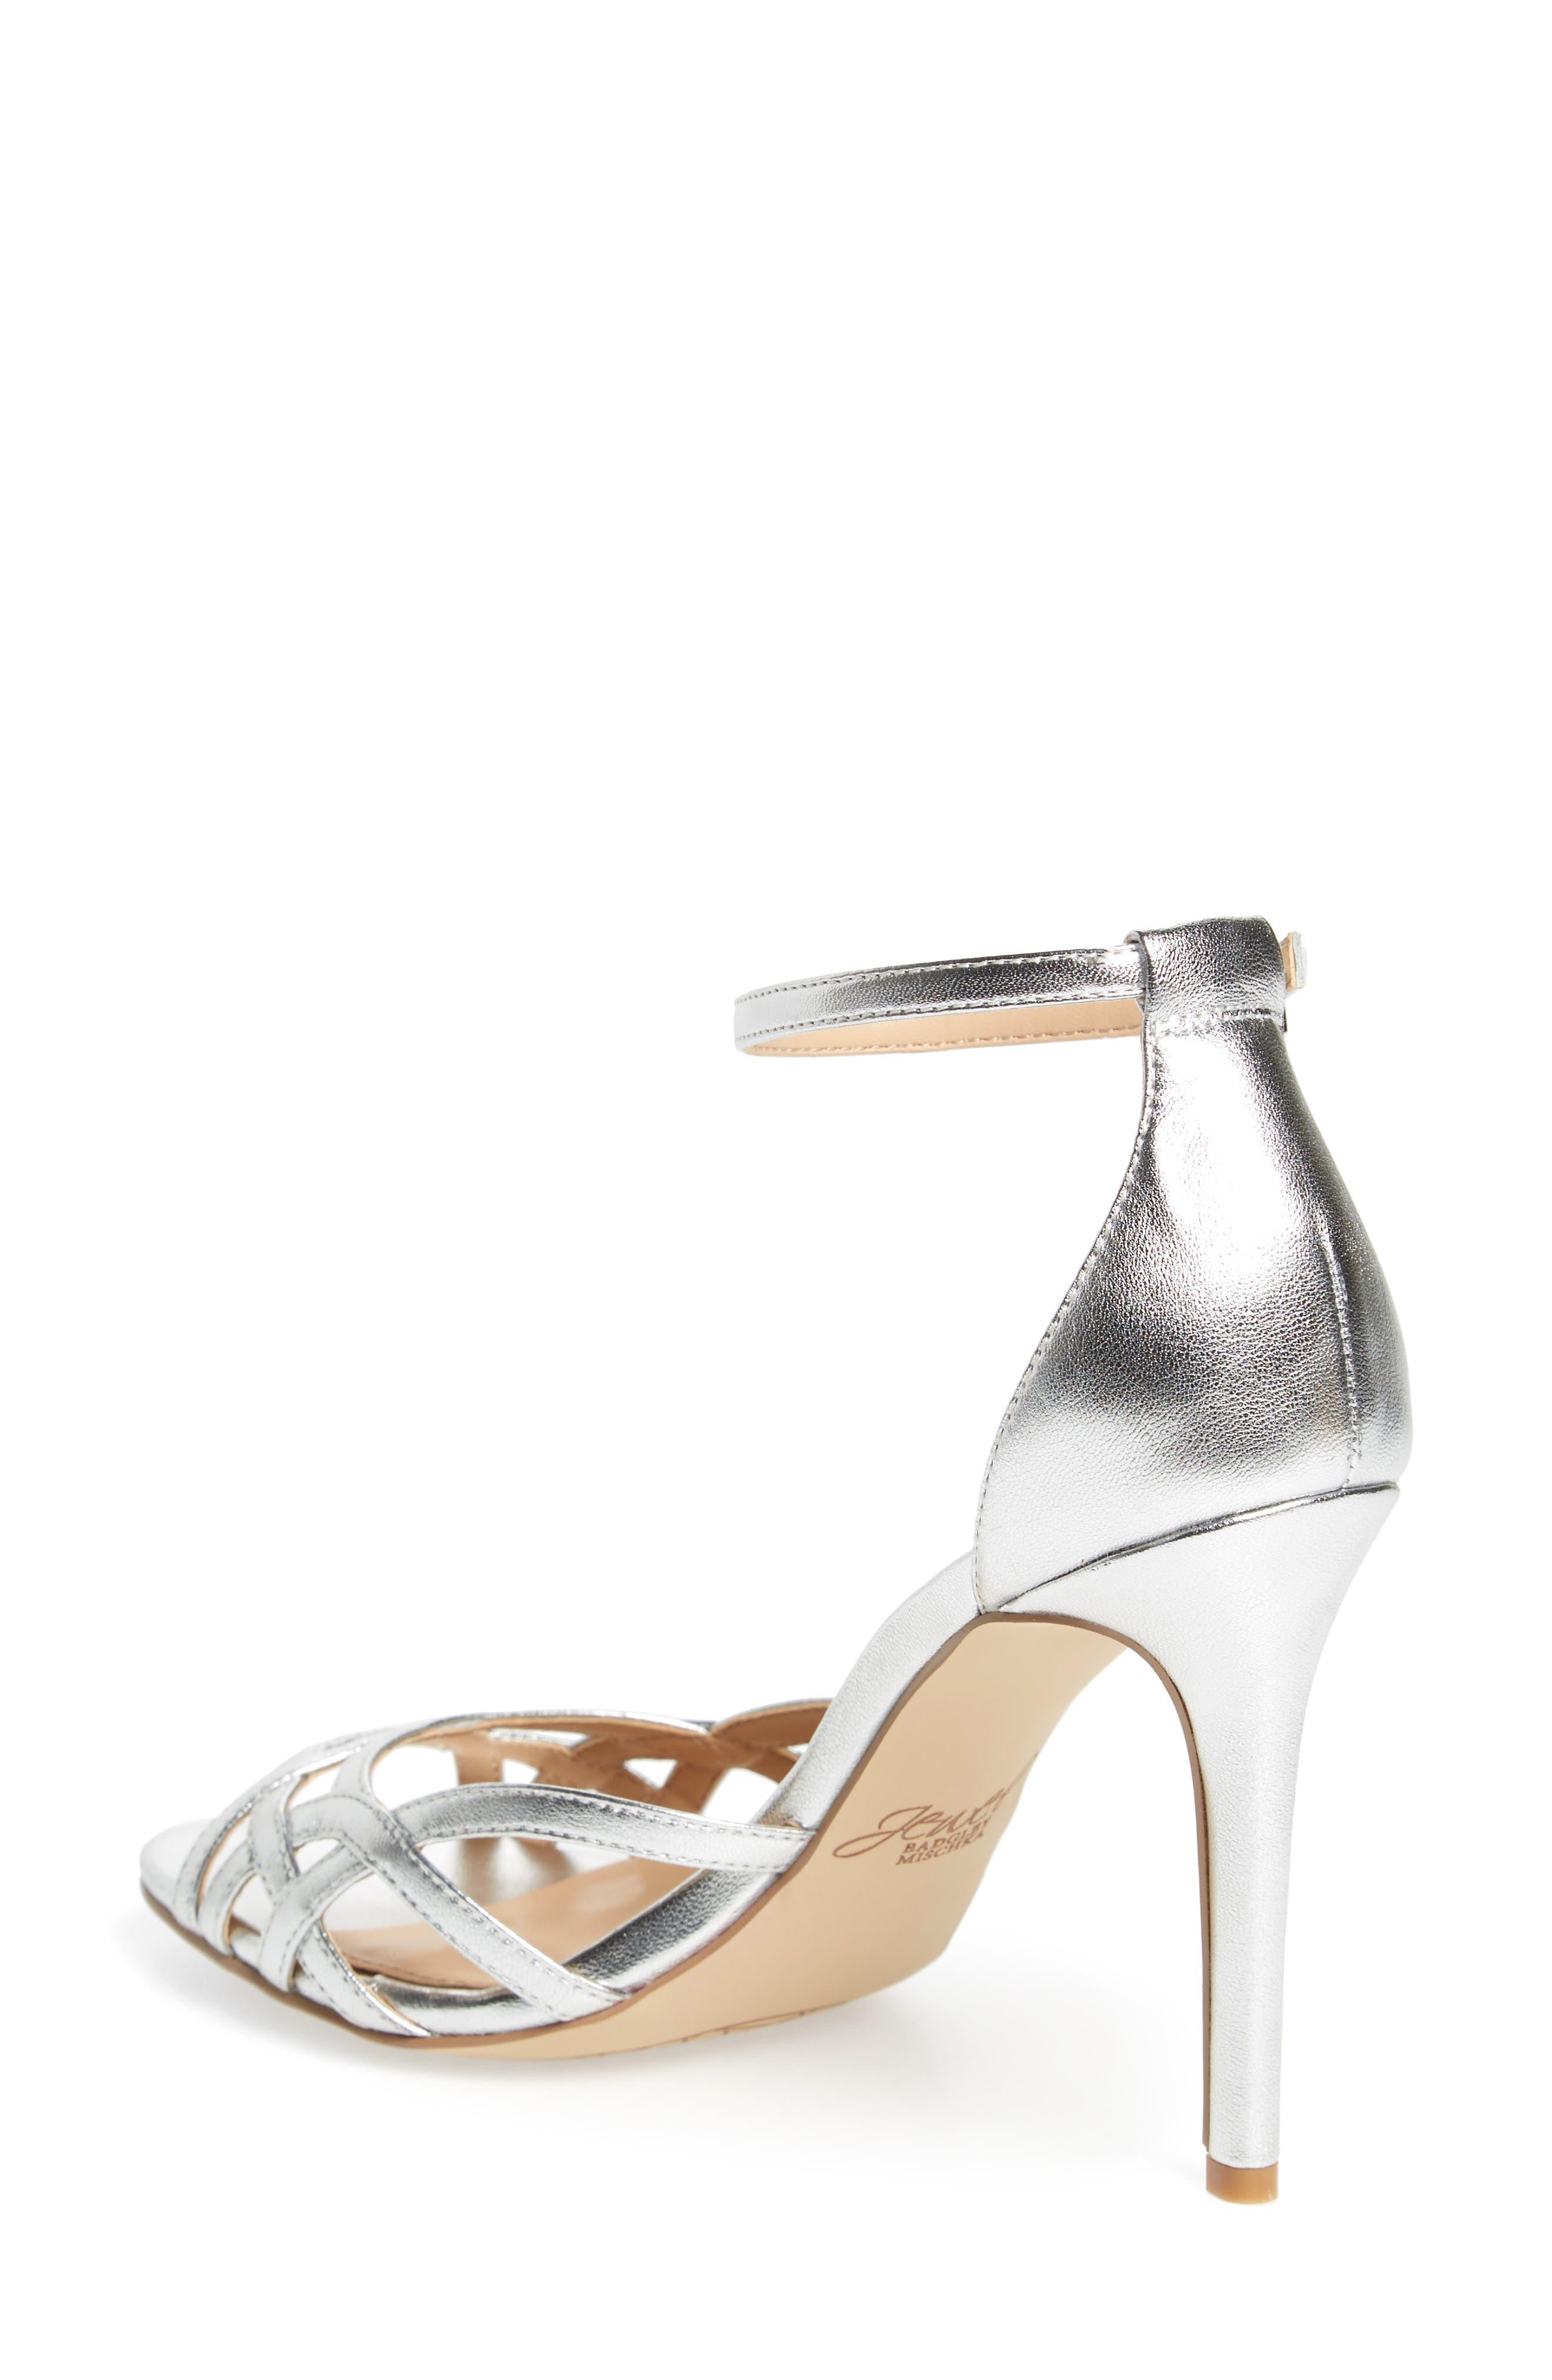 Alternate Image 2  - Jewel Badgley Mischka Haskell II Strappy Sandal (Women)